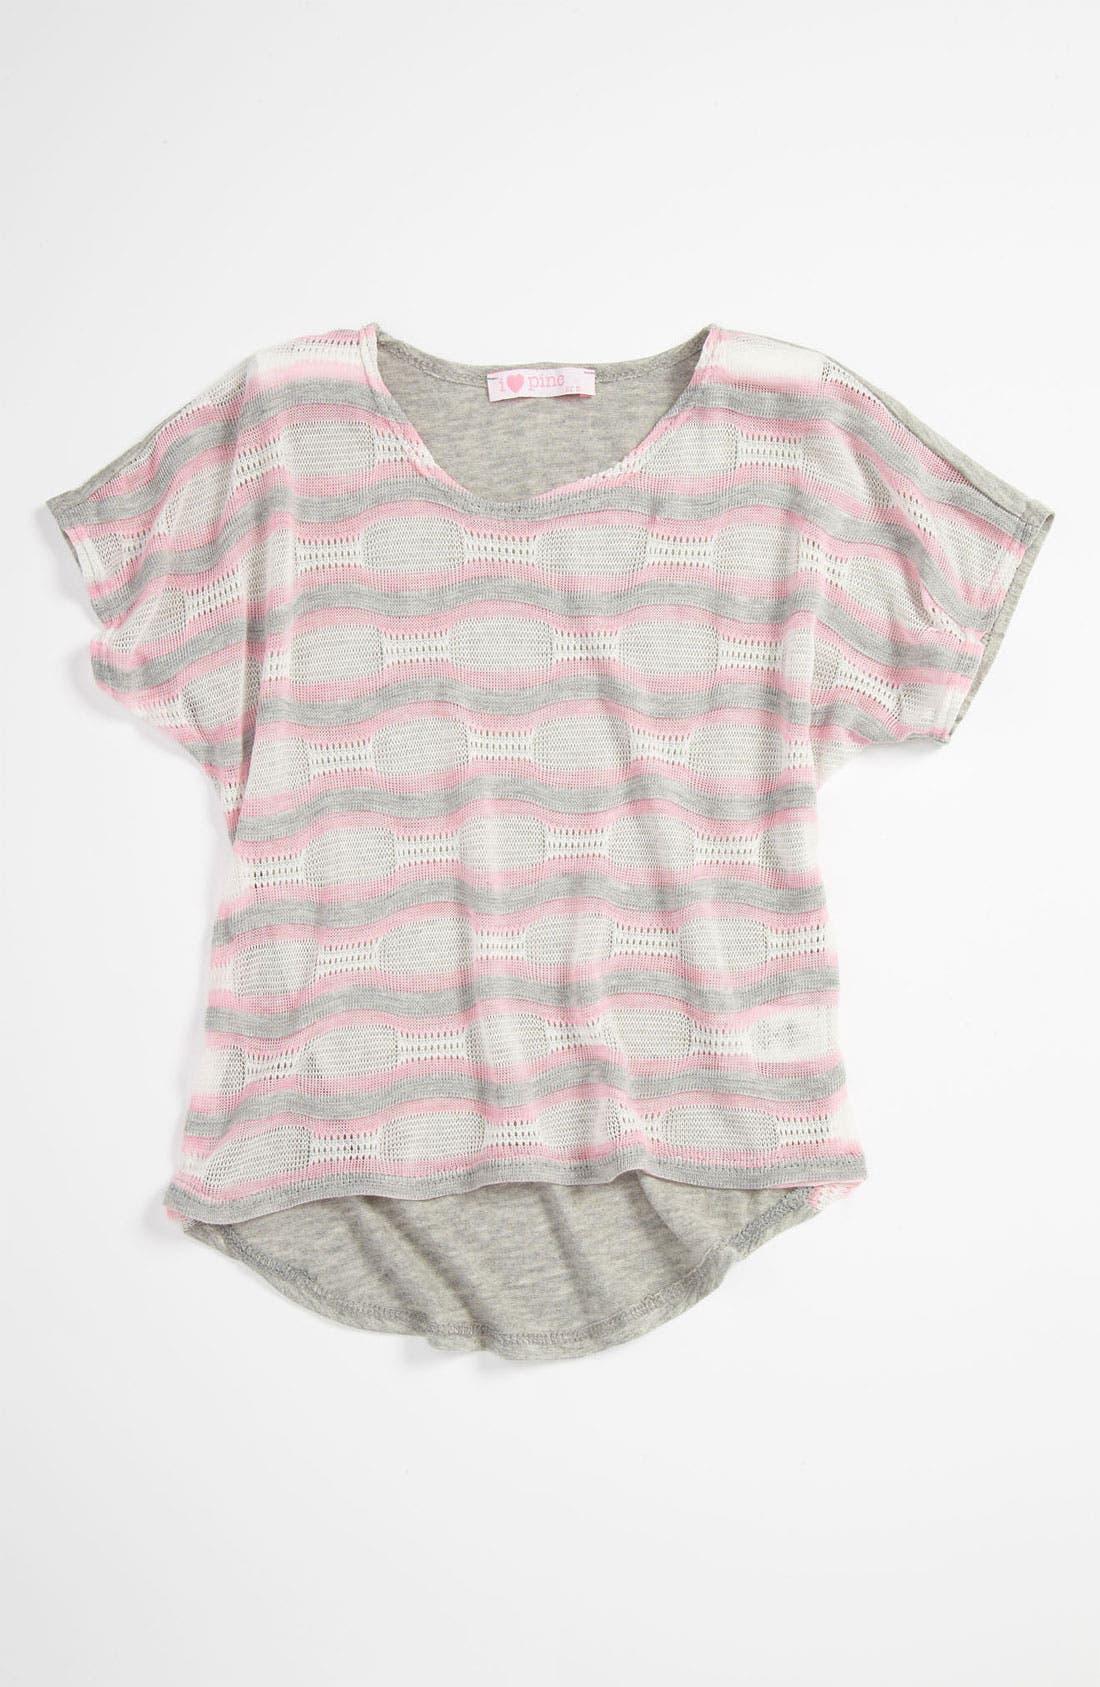 Main Image - I Heart Pinc Knit Top (Big Girls)